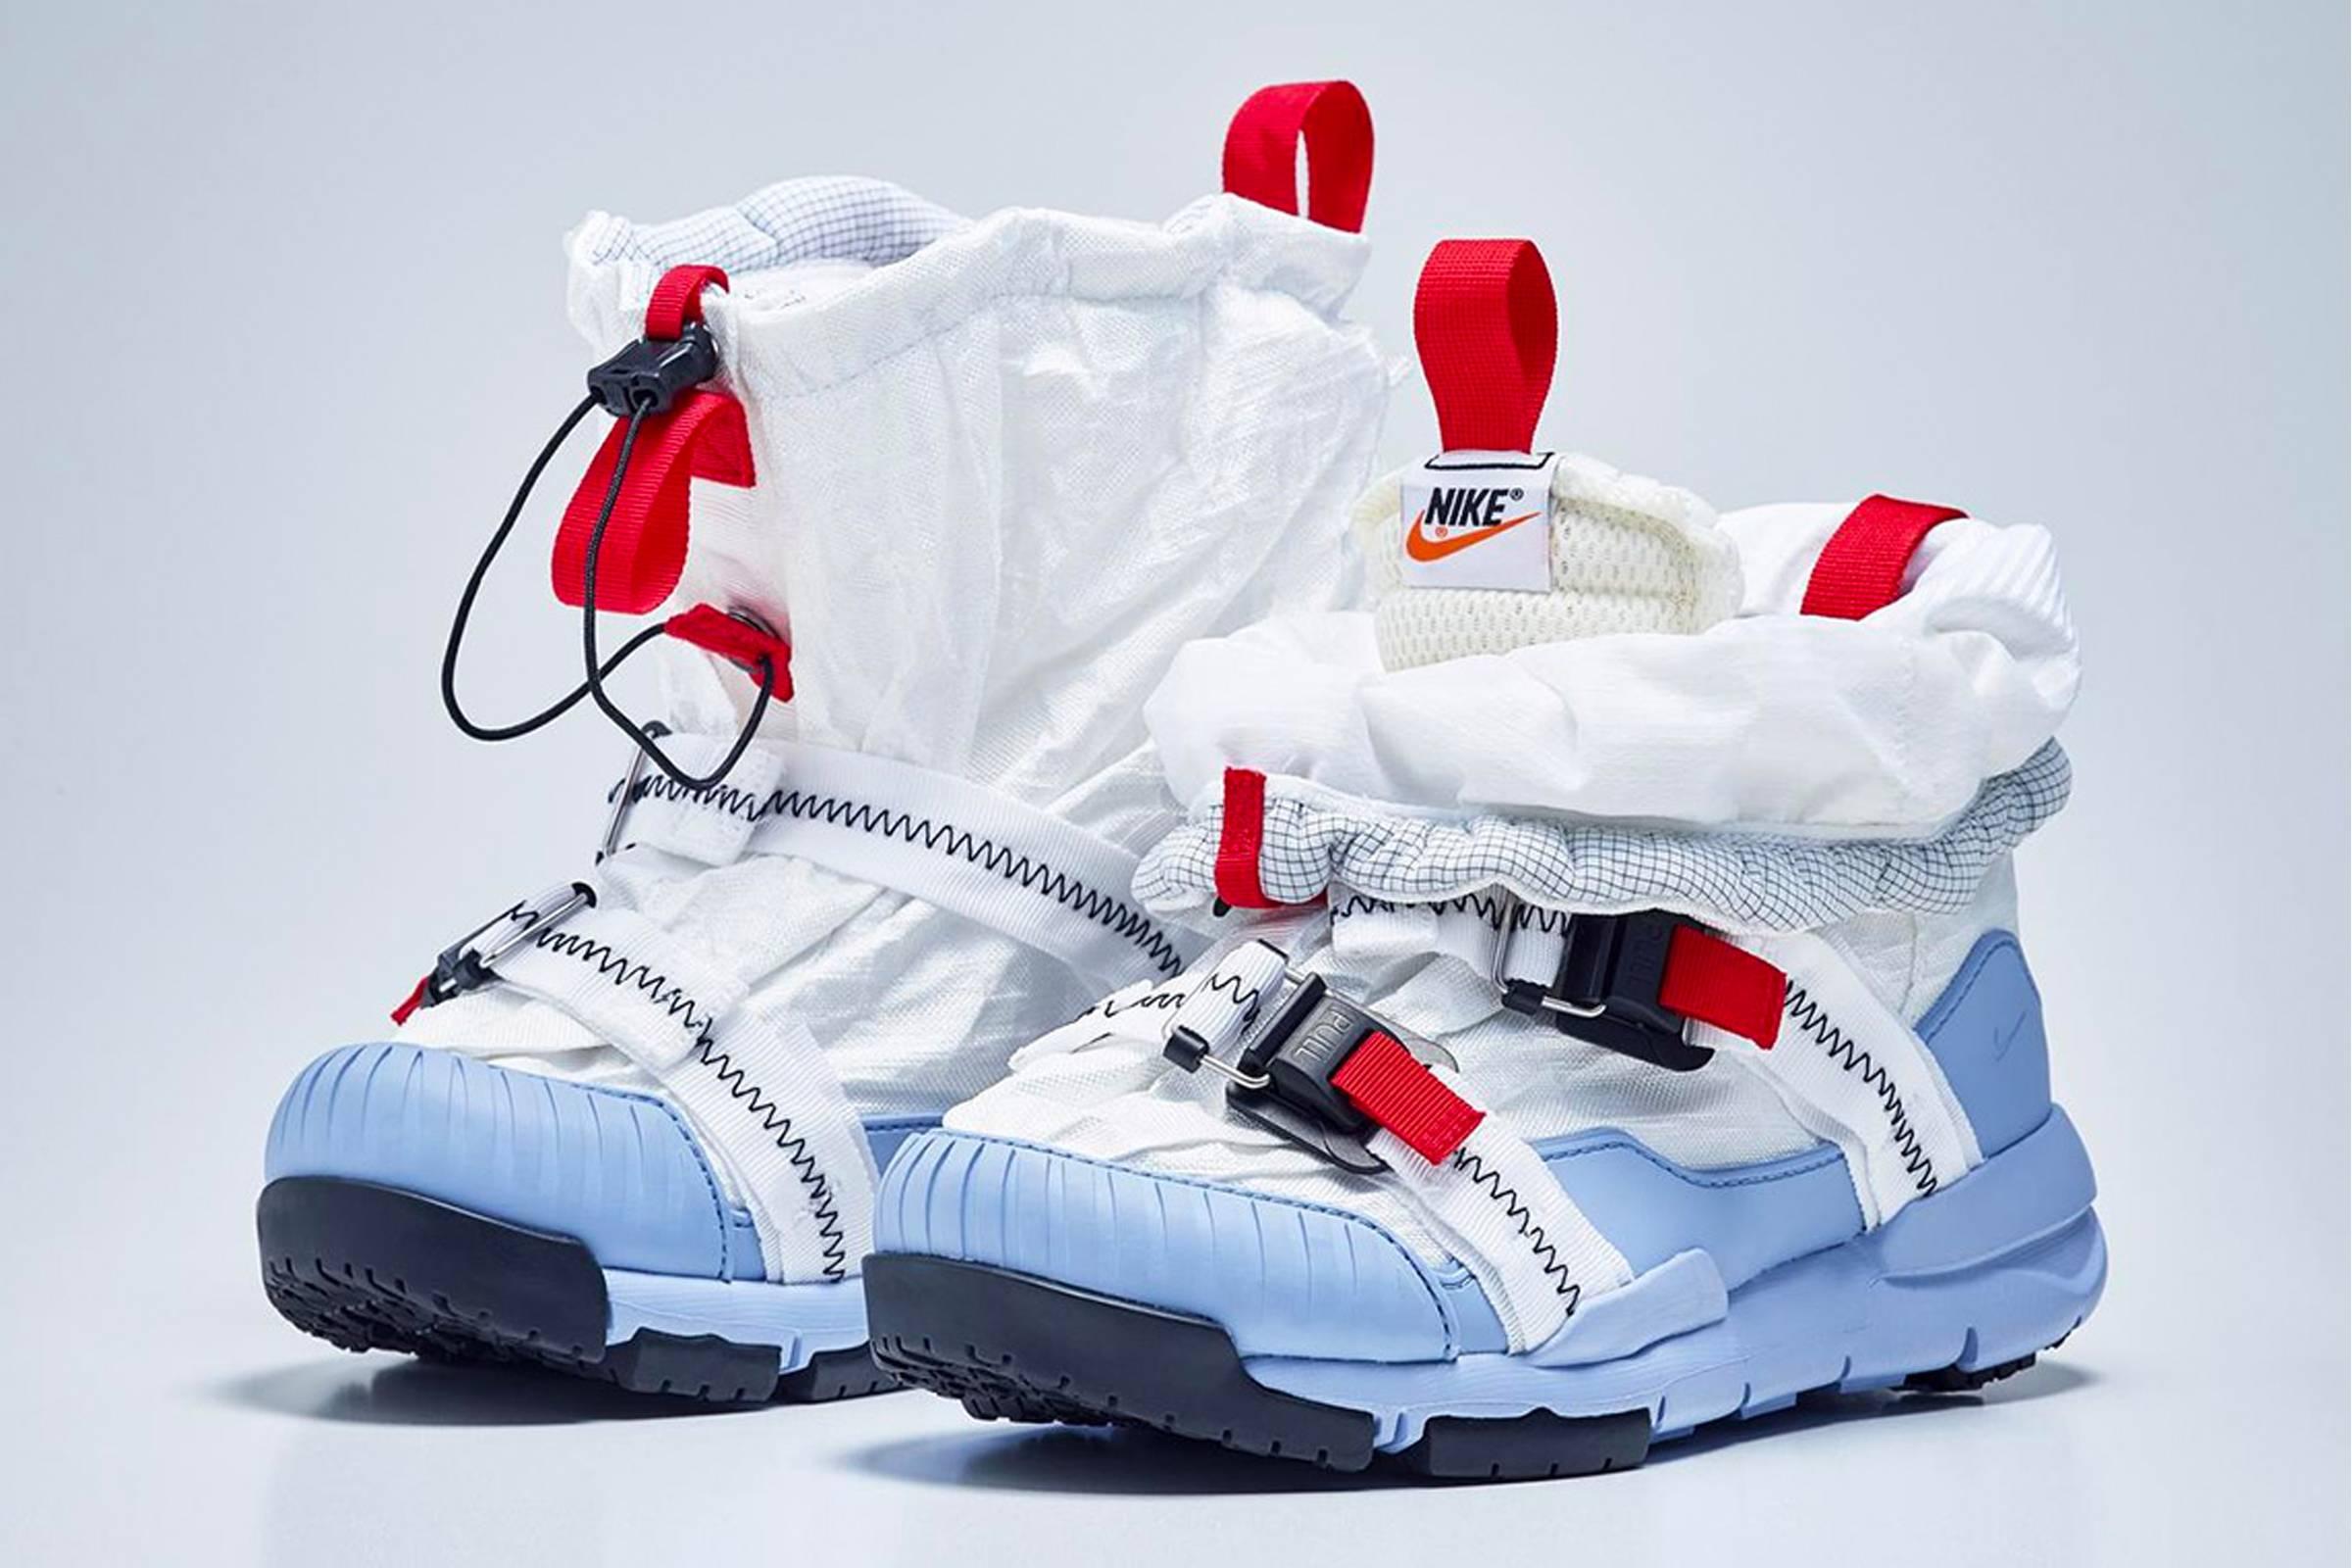 Nike x Tom Sachs Mars Yard Overshoe (2018)